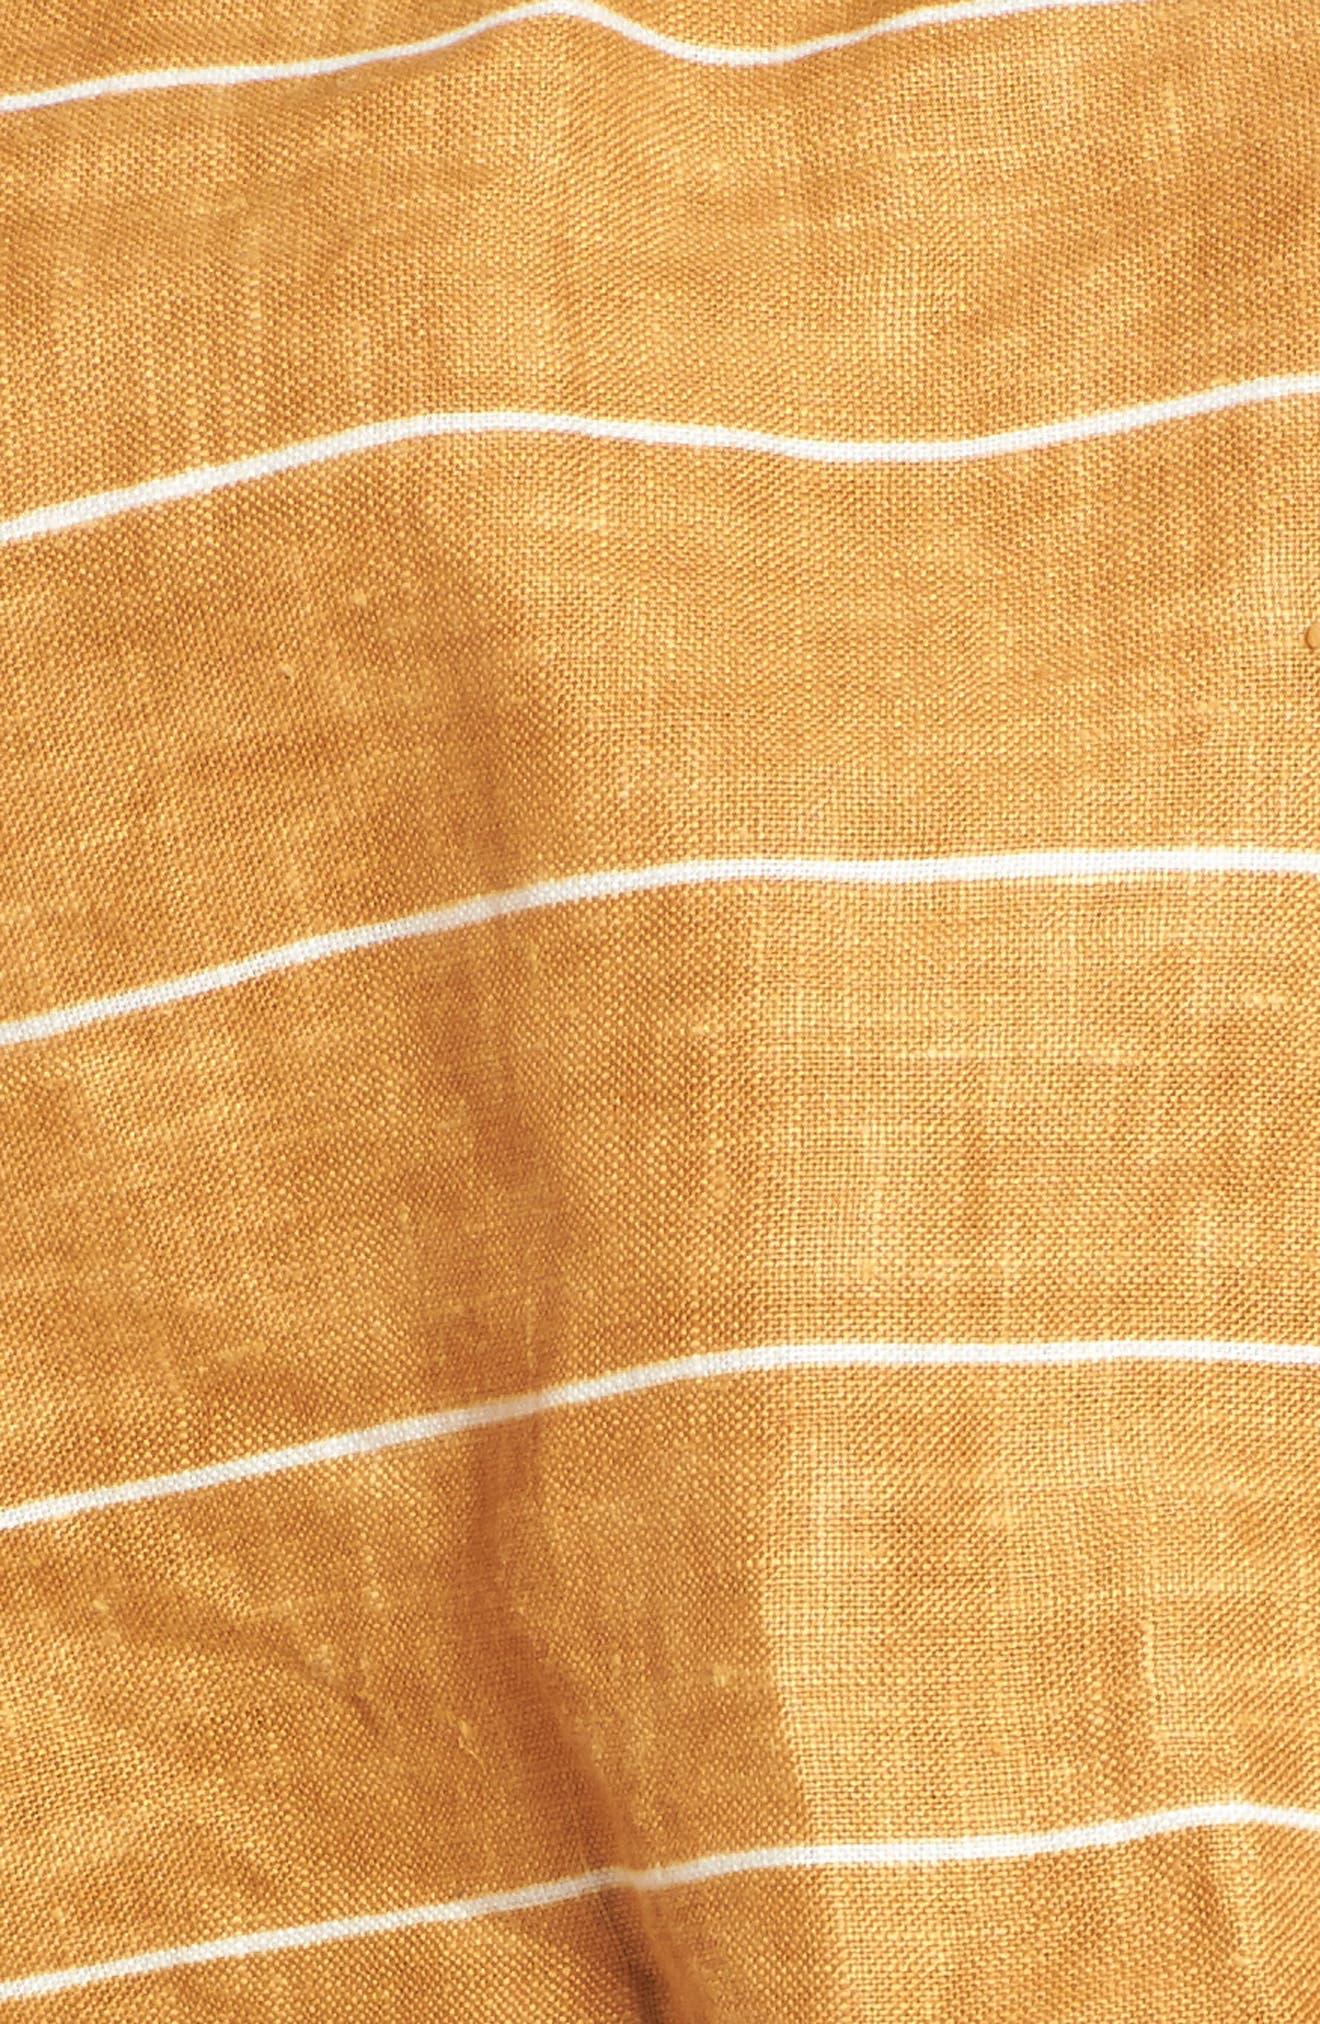 Solana Stripe Strapless Linen Crop Top,                             Alternate thumbnail 5, color,                             700